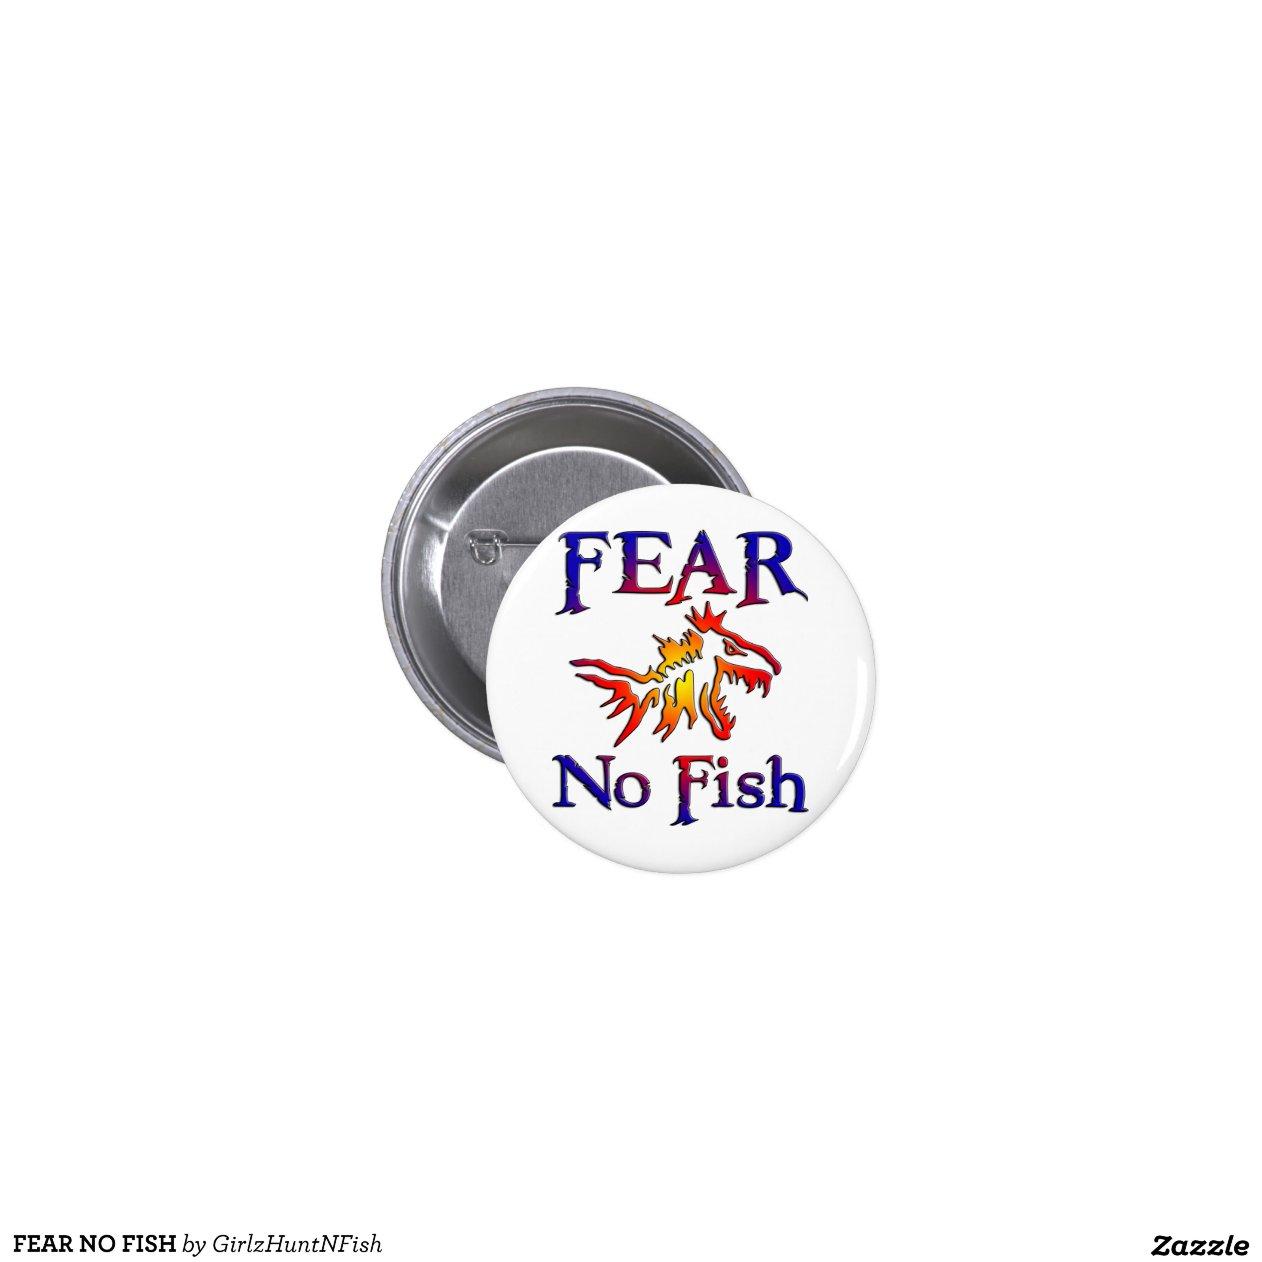 Fear no fish pin zazzle for Fear no fish